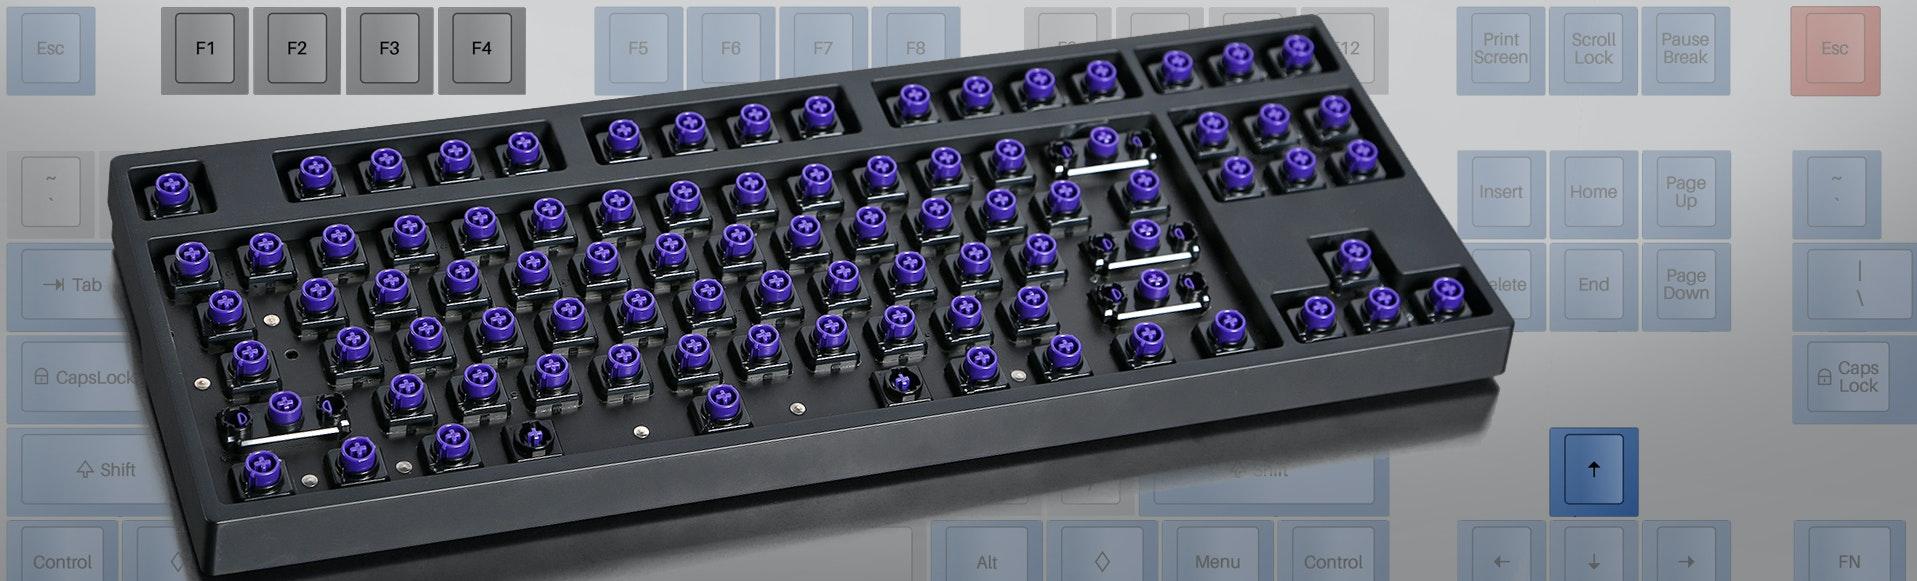 Super NovaTouch Keyboard